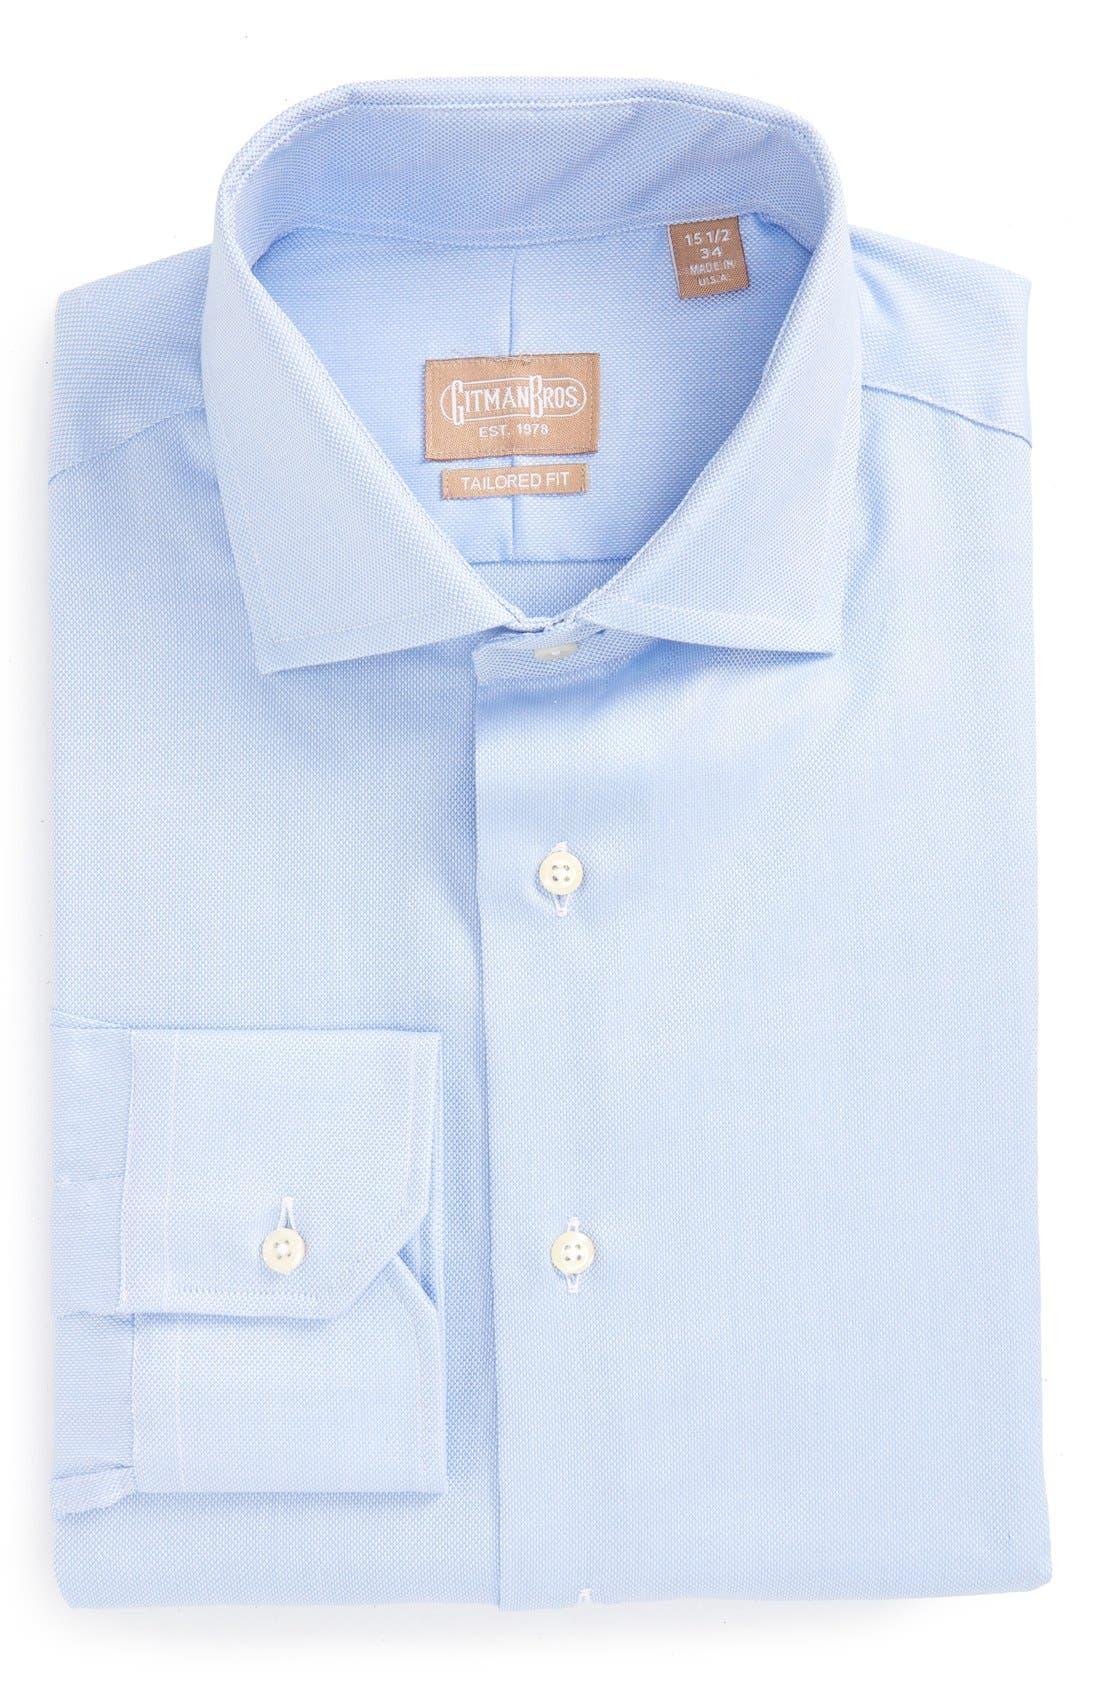 Royal Oxford Tailored Fit Dress Shirt,                             Alternate thumbnail 3, color,                             BLUE